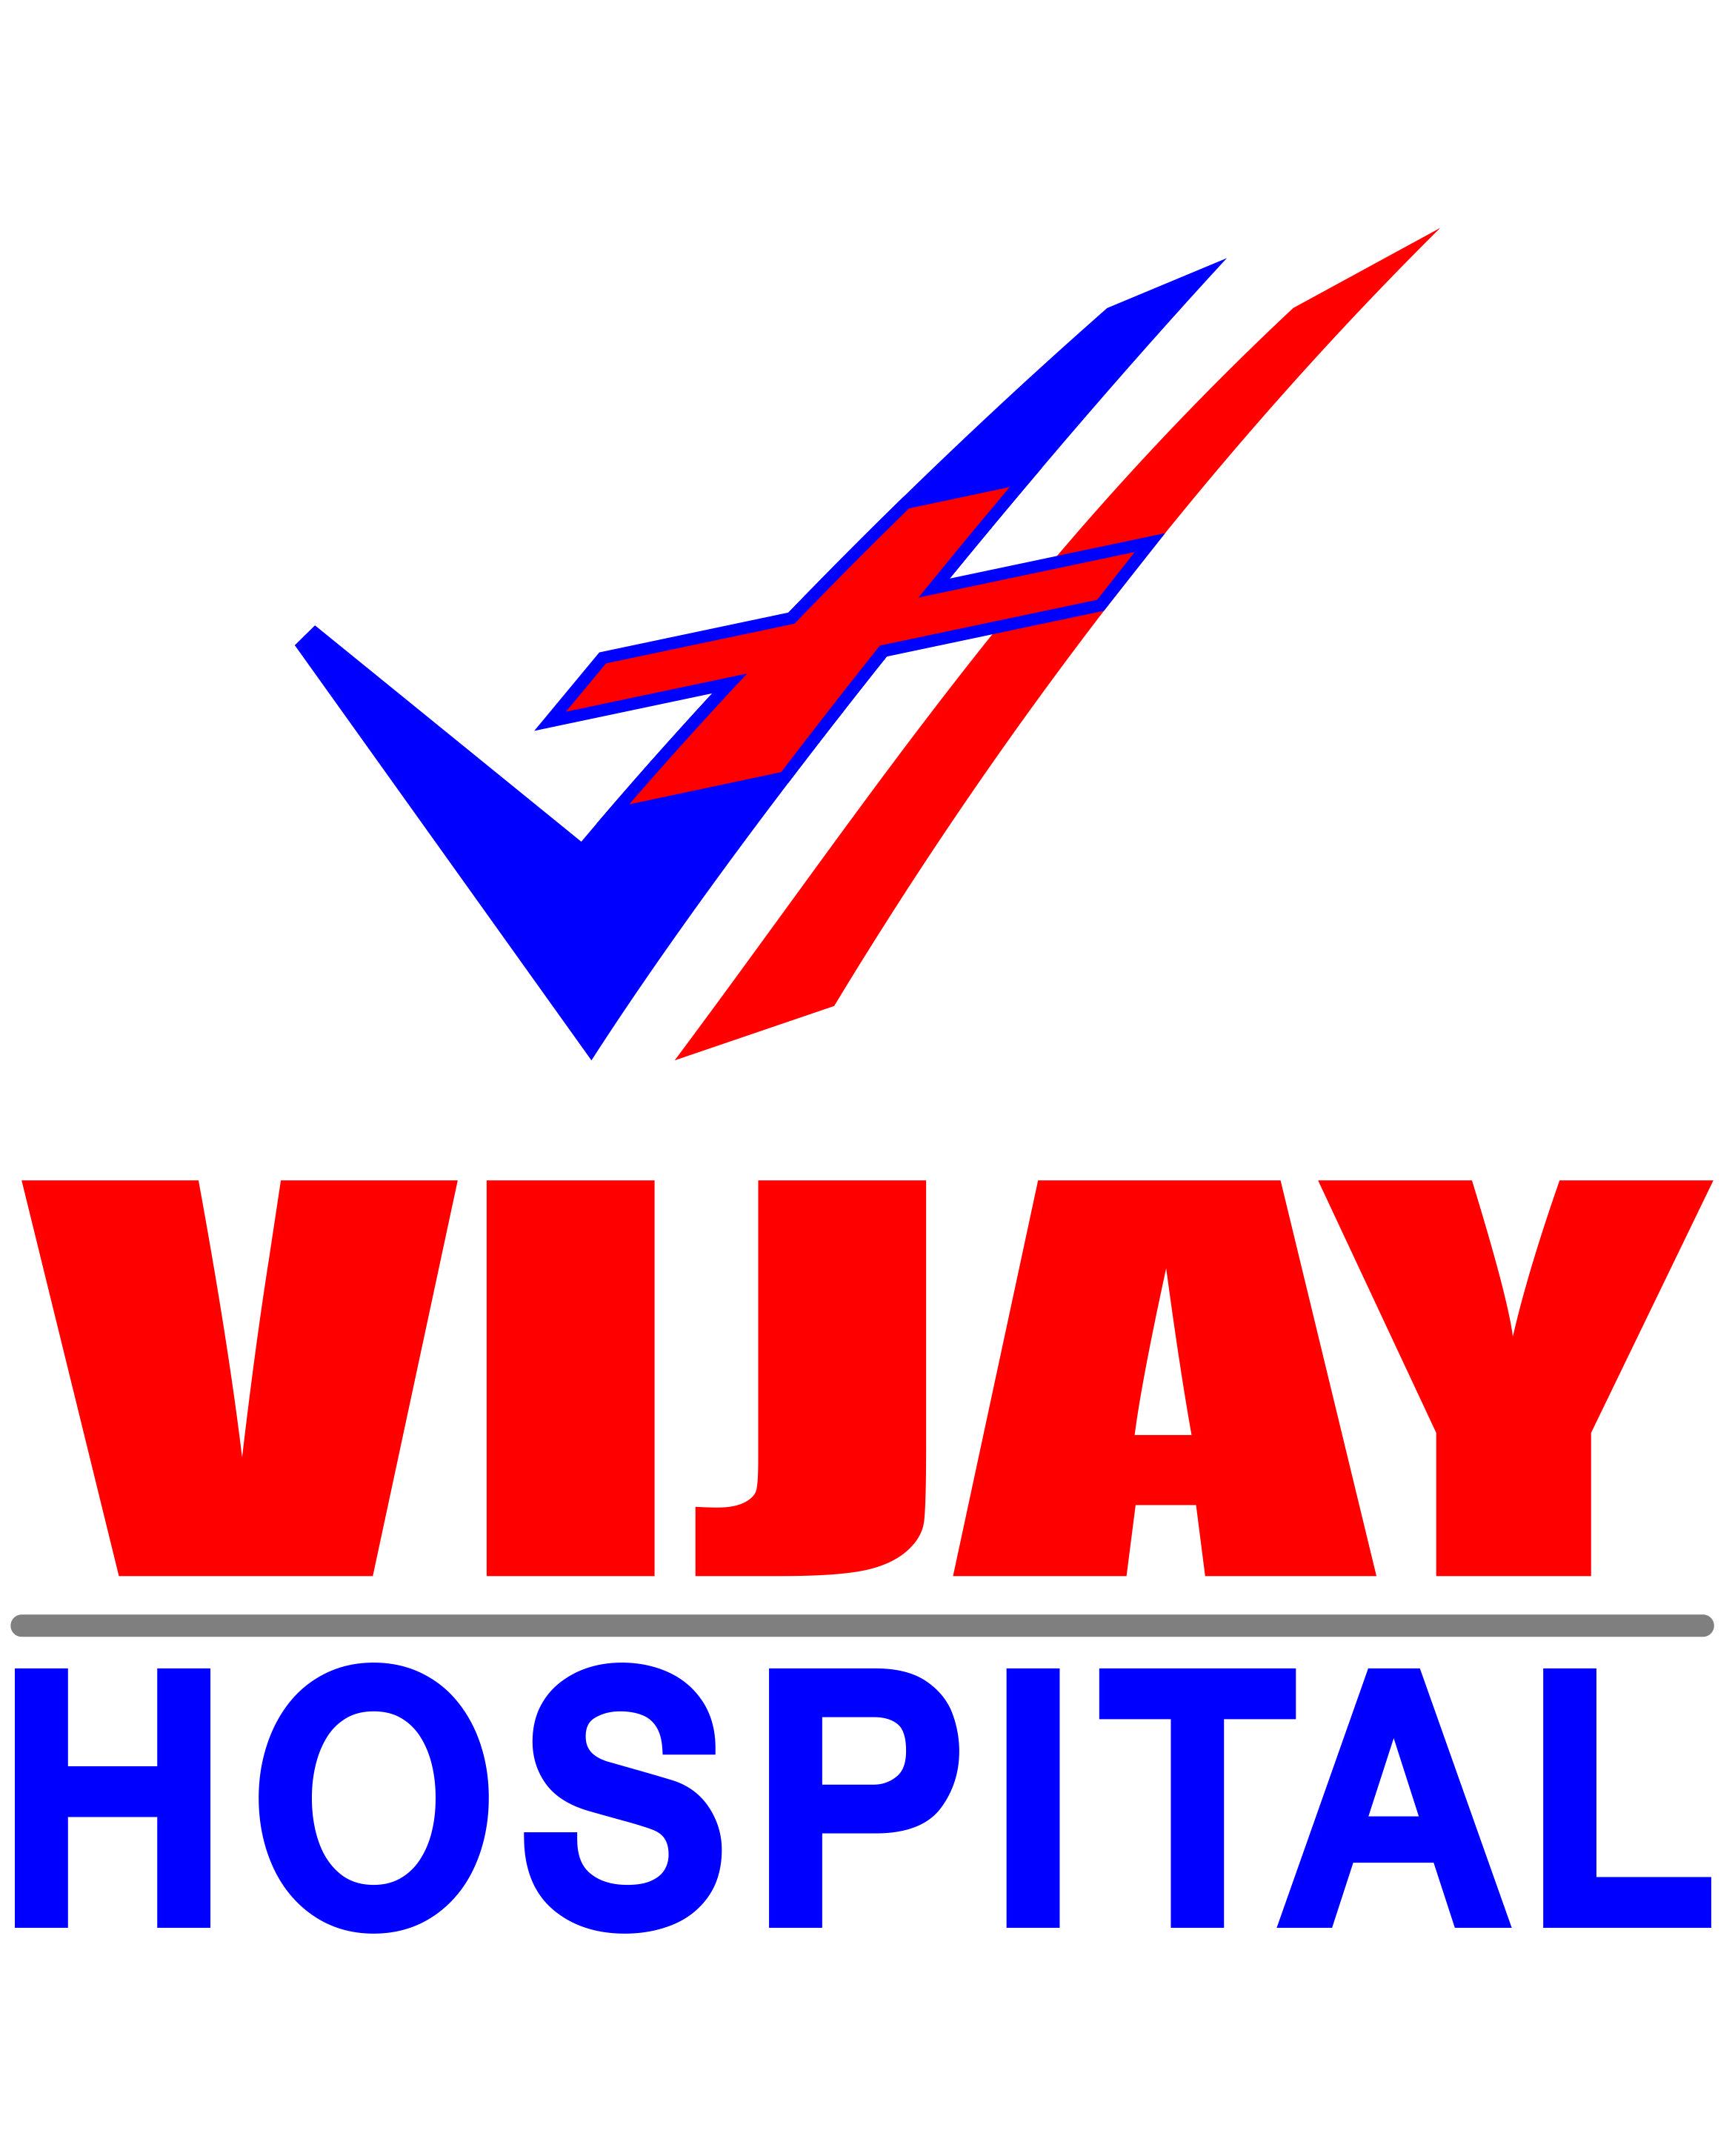 Vijay Hospital and Diagnostic Centre